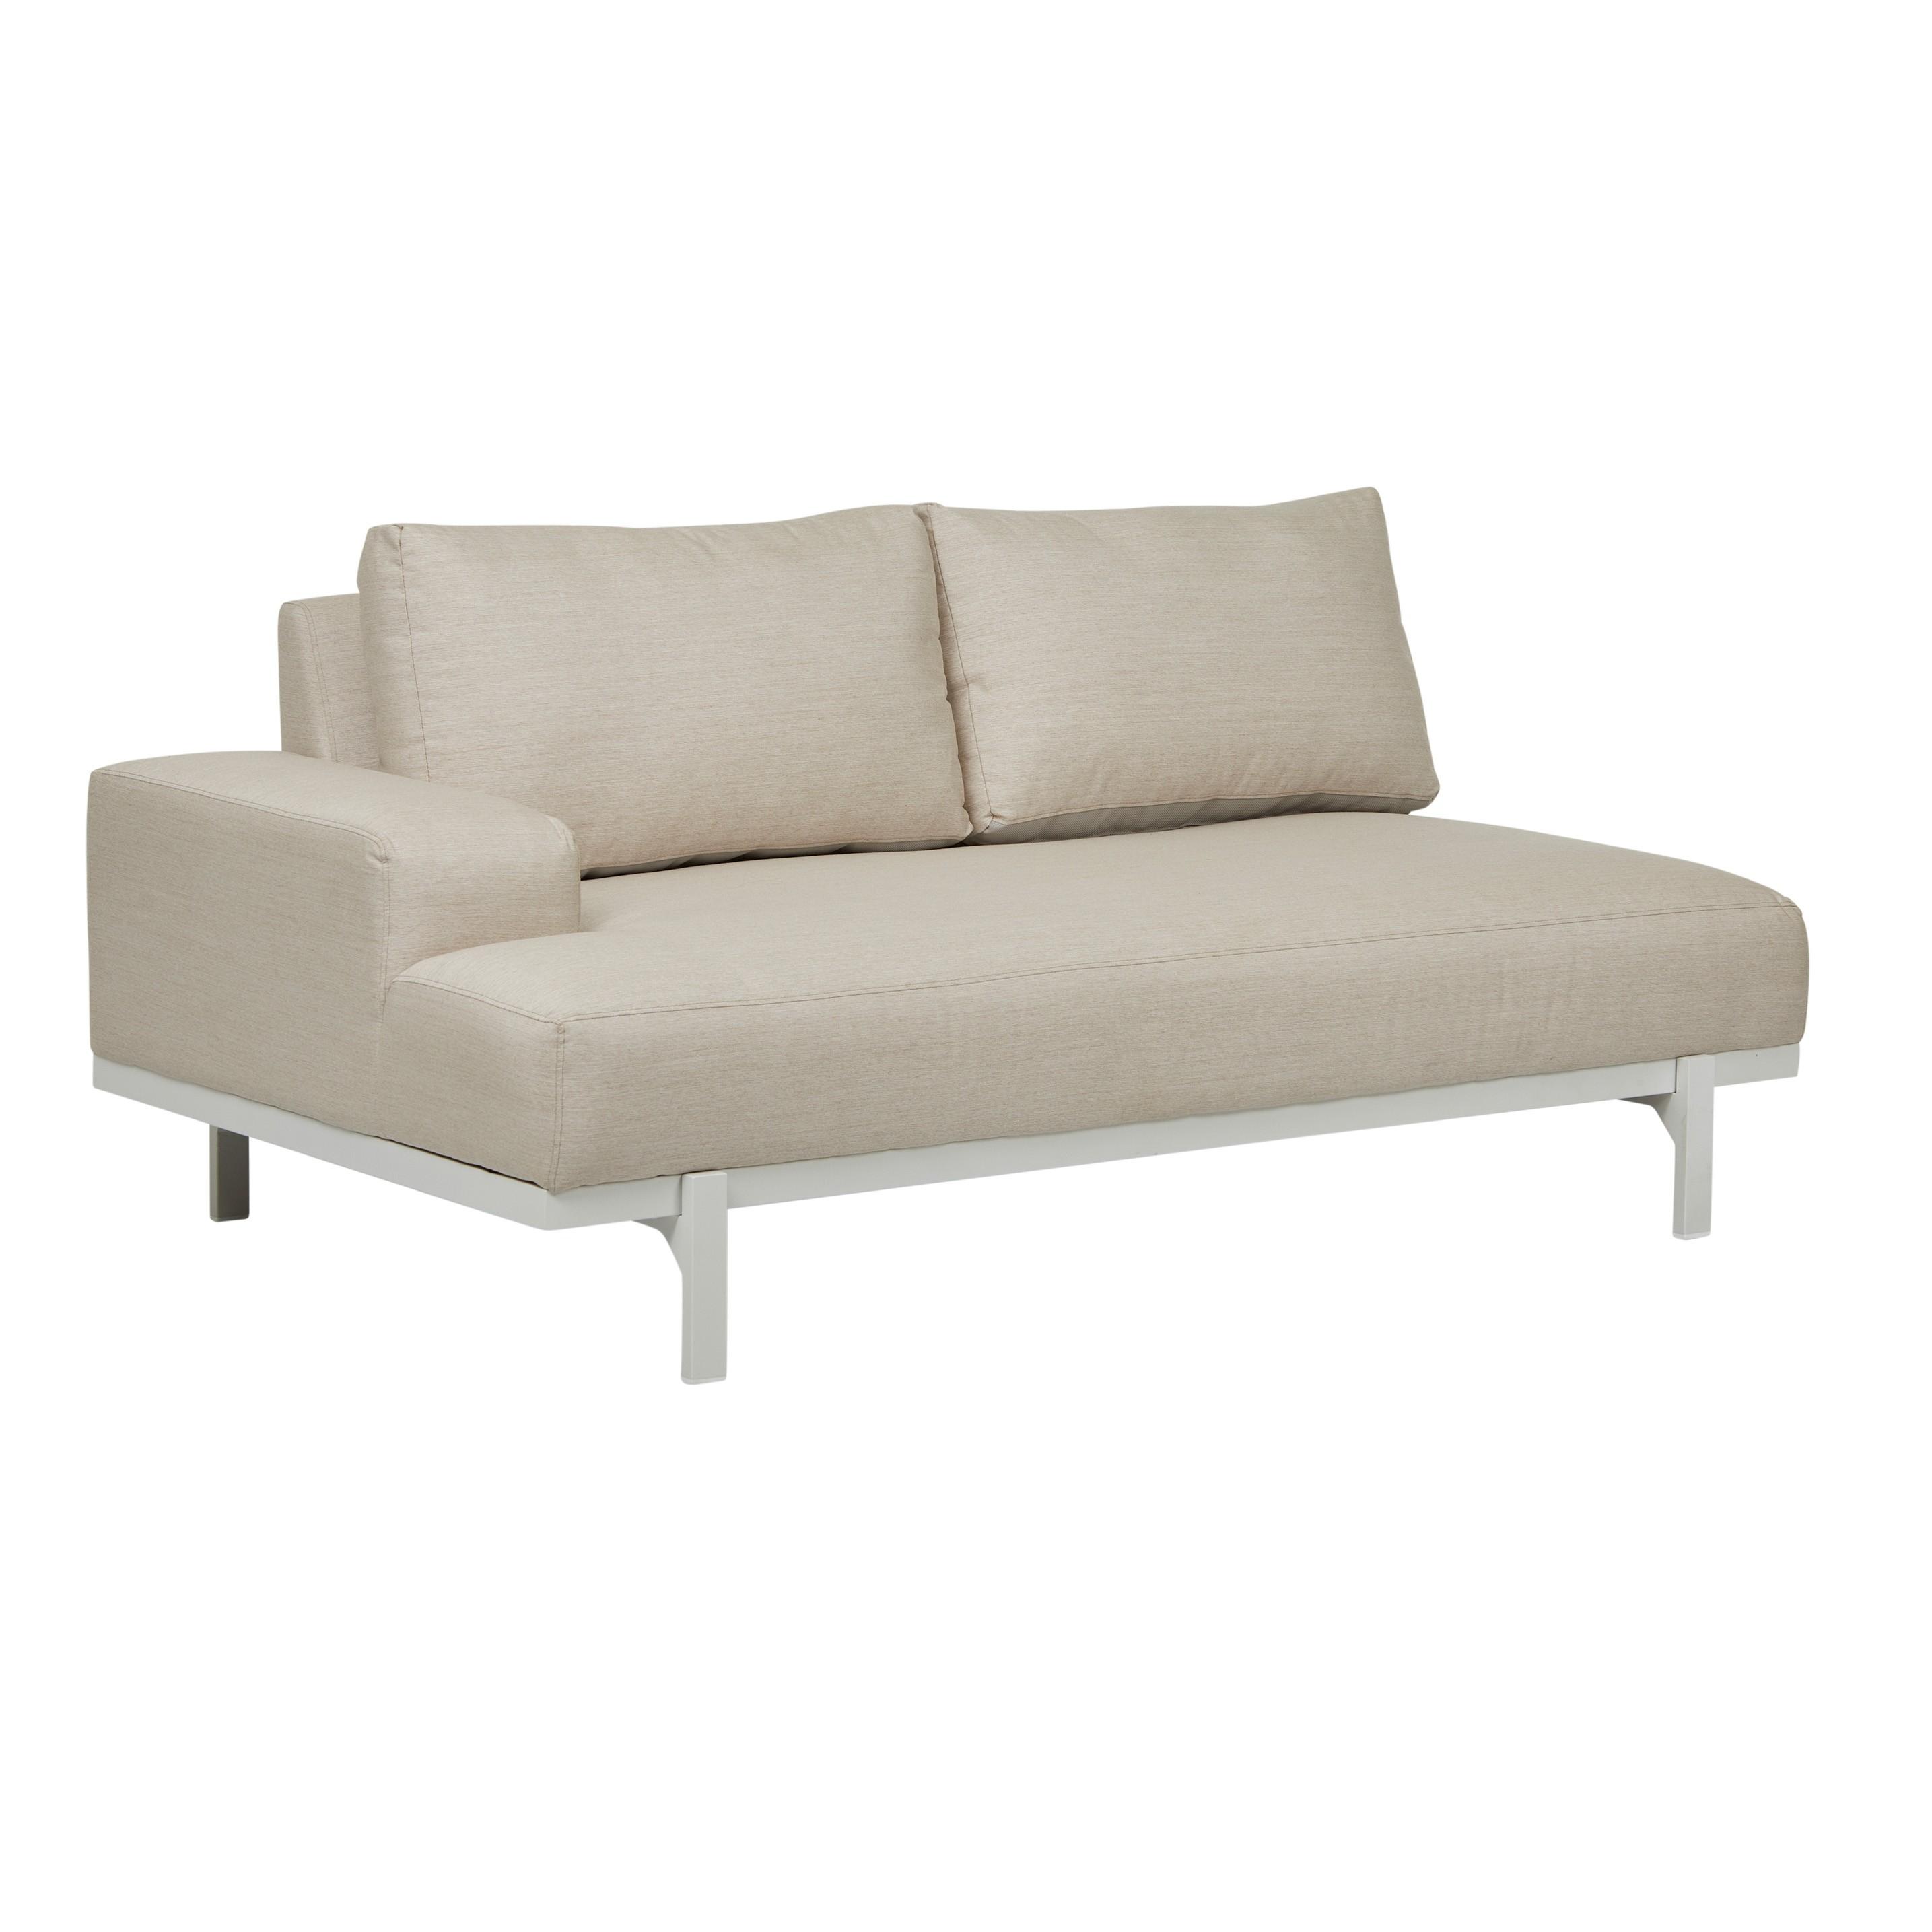 Furniture Hero-Images Sofas aruba-platform-two-seater-left-02